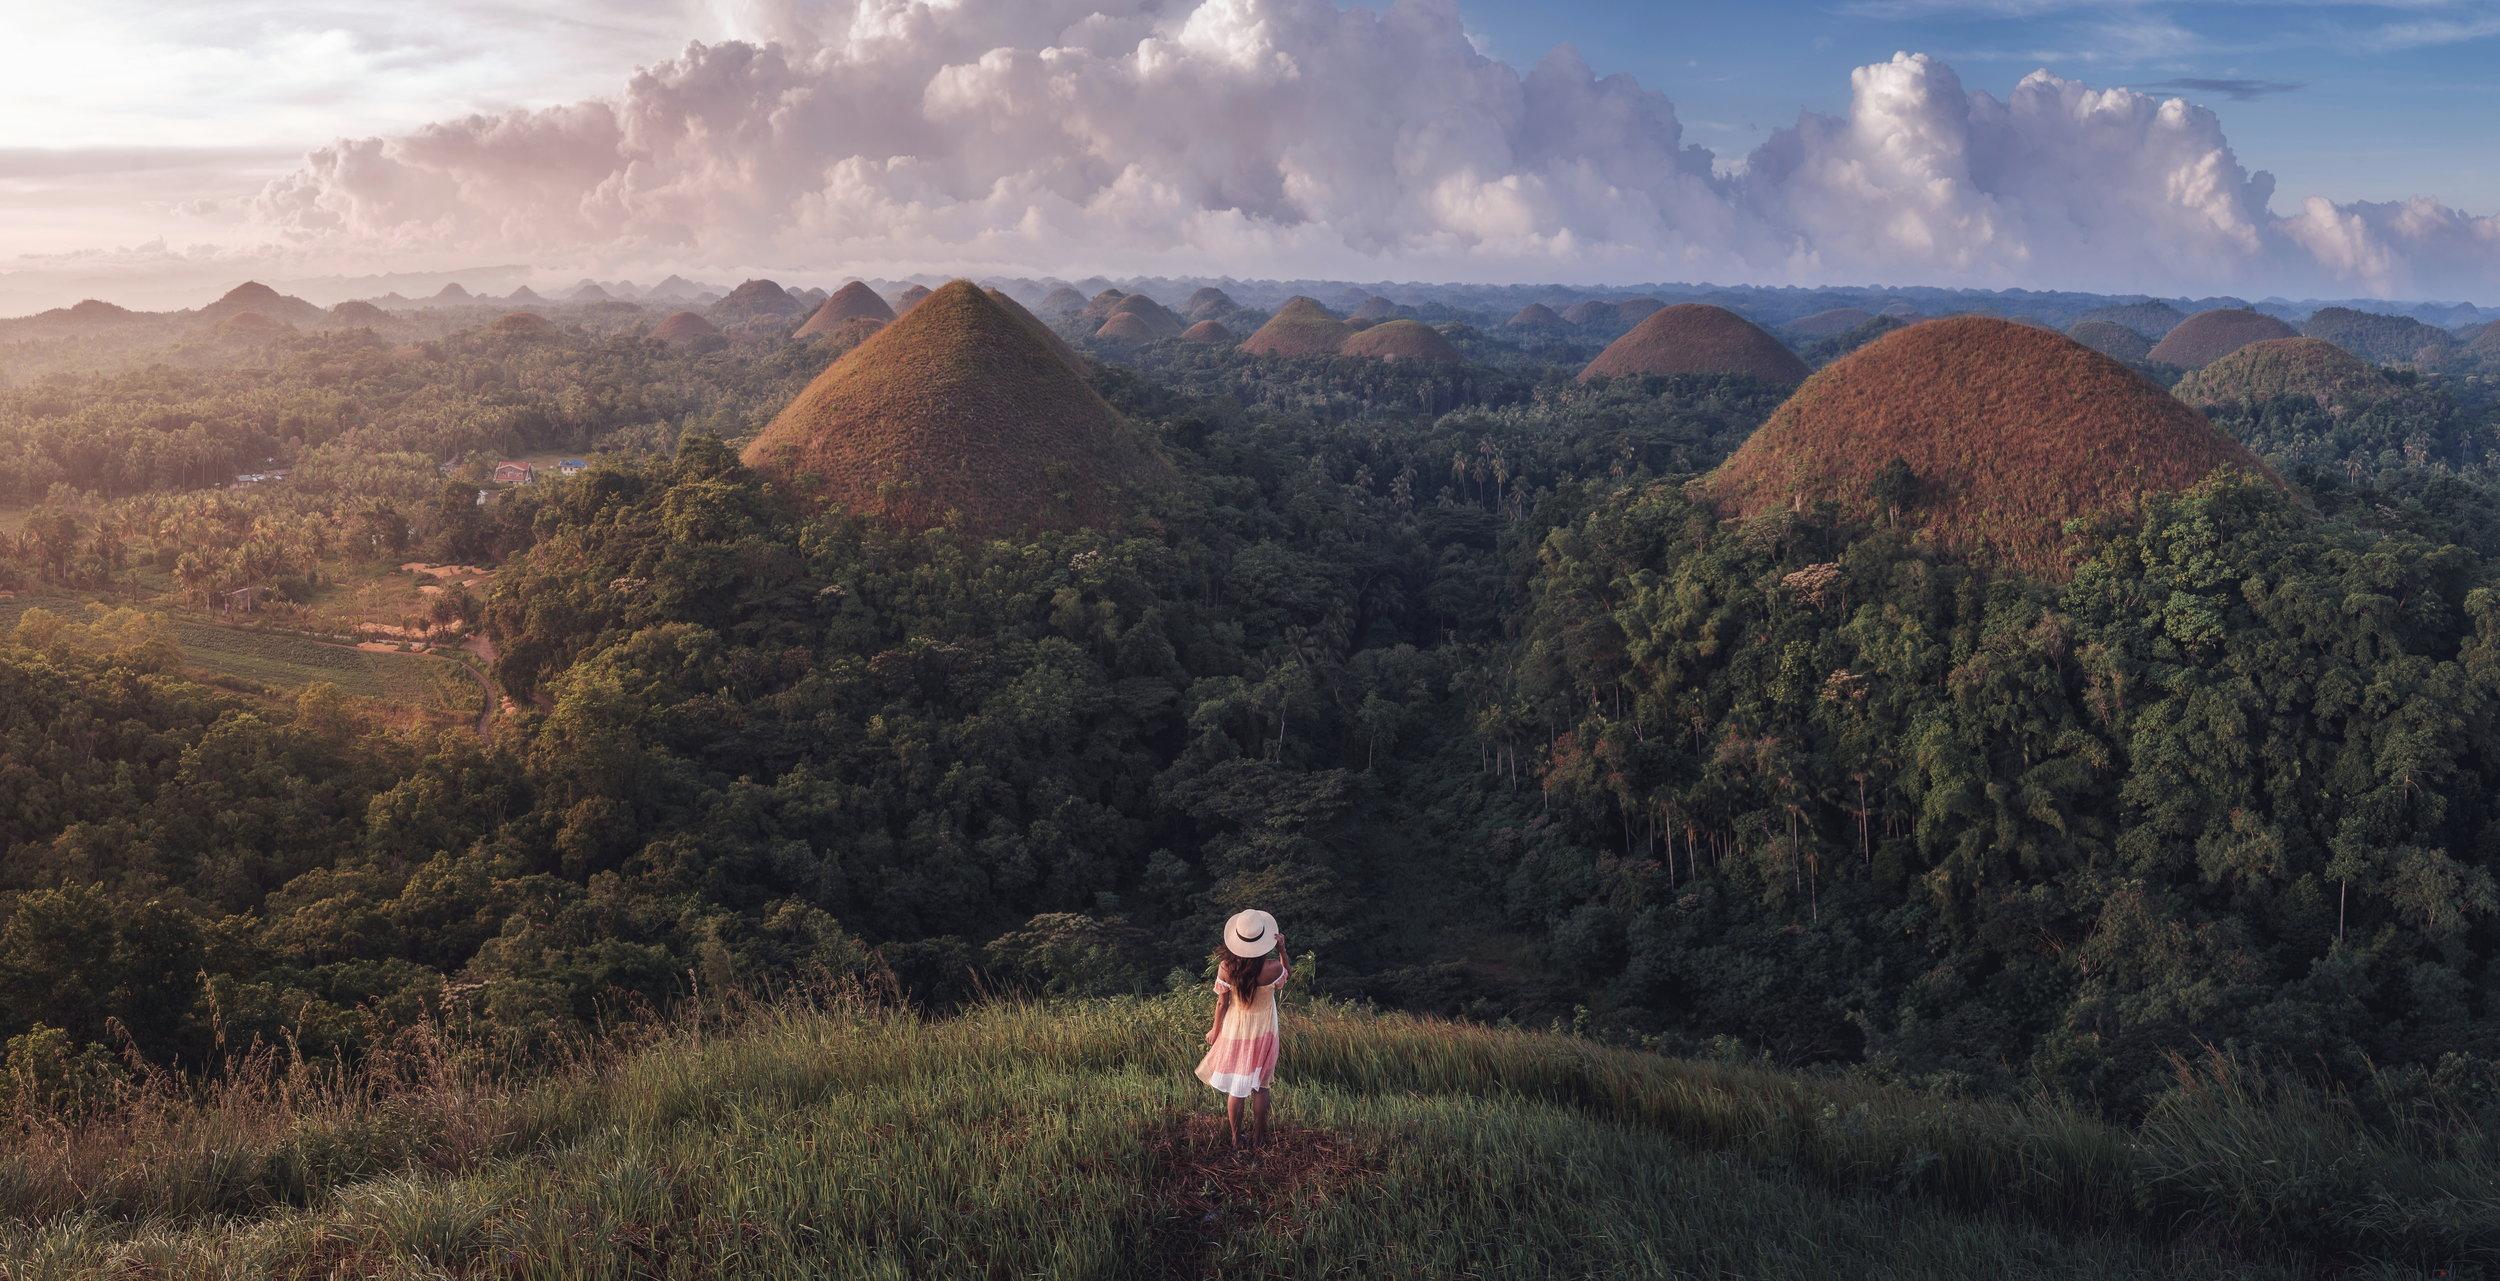 Chocolate Hills - Bohol - Philippines 2018